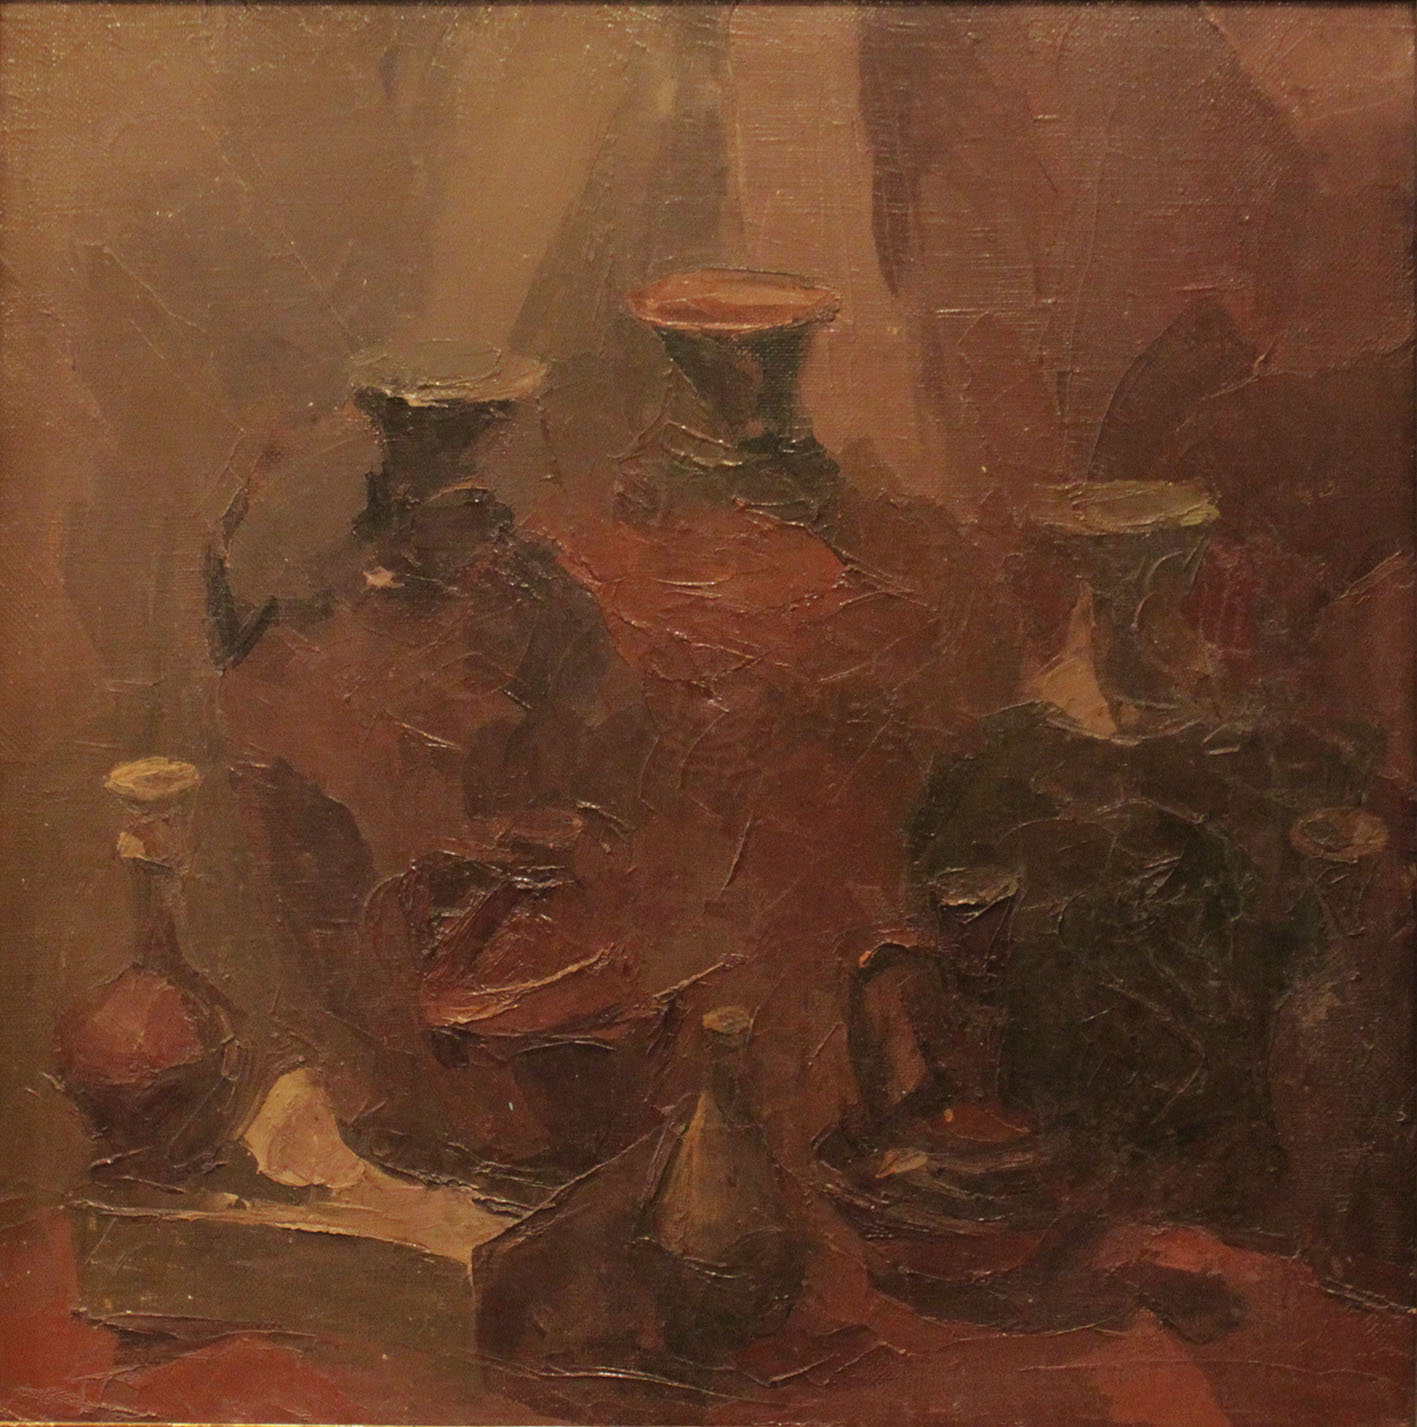 Игорь Бушуев.        Керамика.      1999 г.     Холст, масло.      60х60 см.